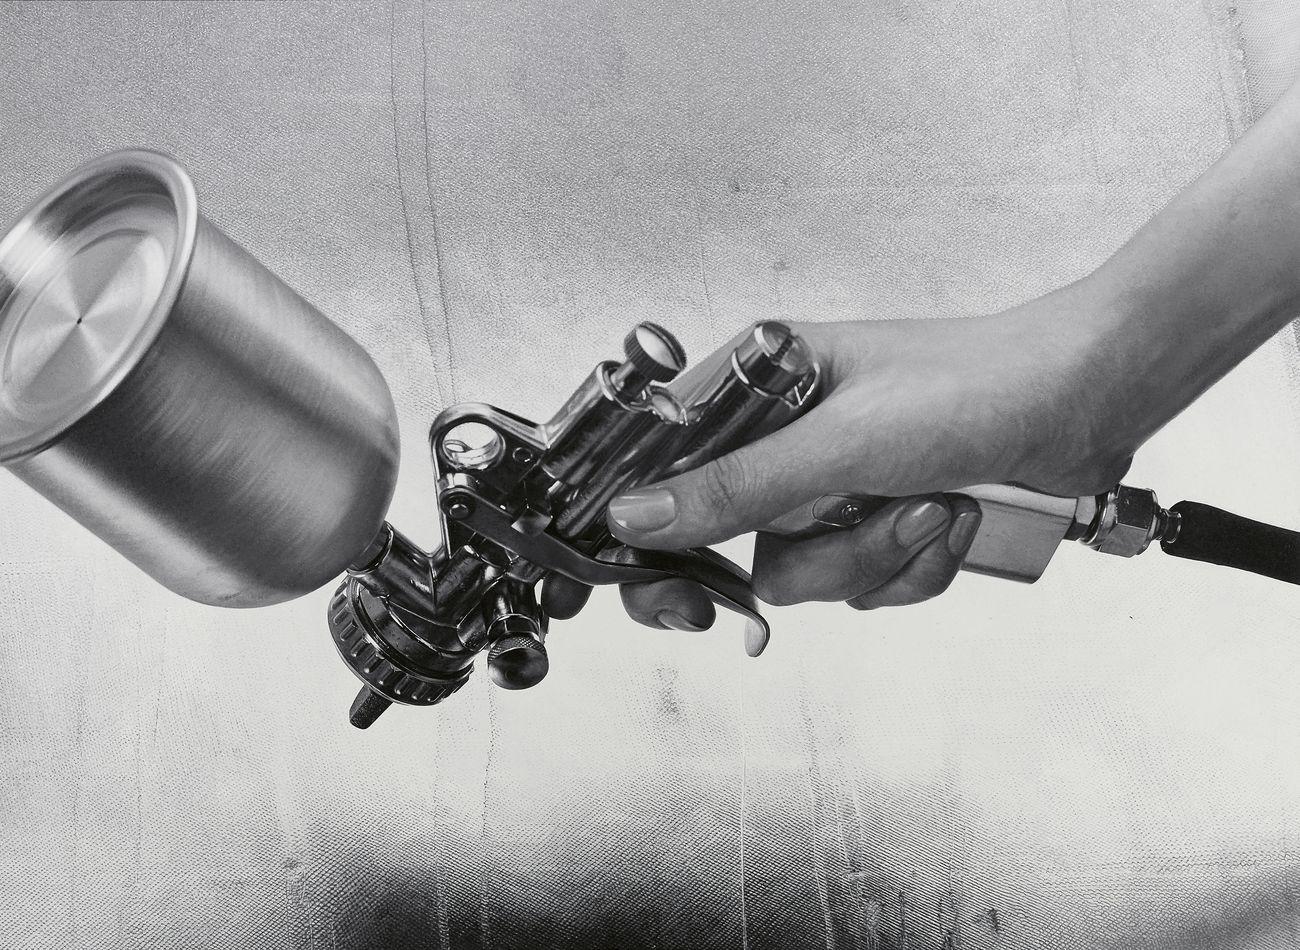 Rudolf Stingel, Untitled, 2019 © Rudolf Stingel. Photo John Lehr